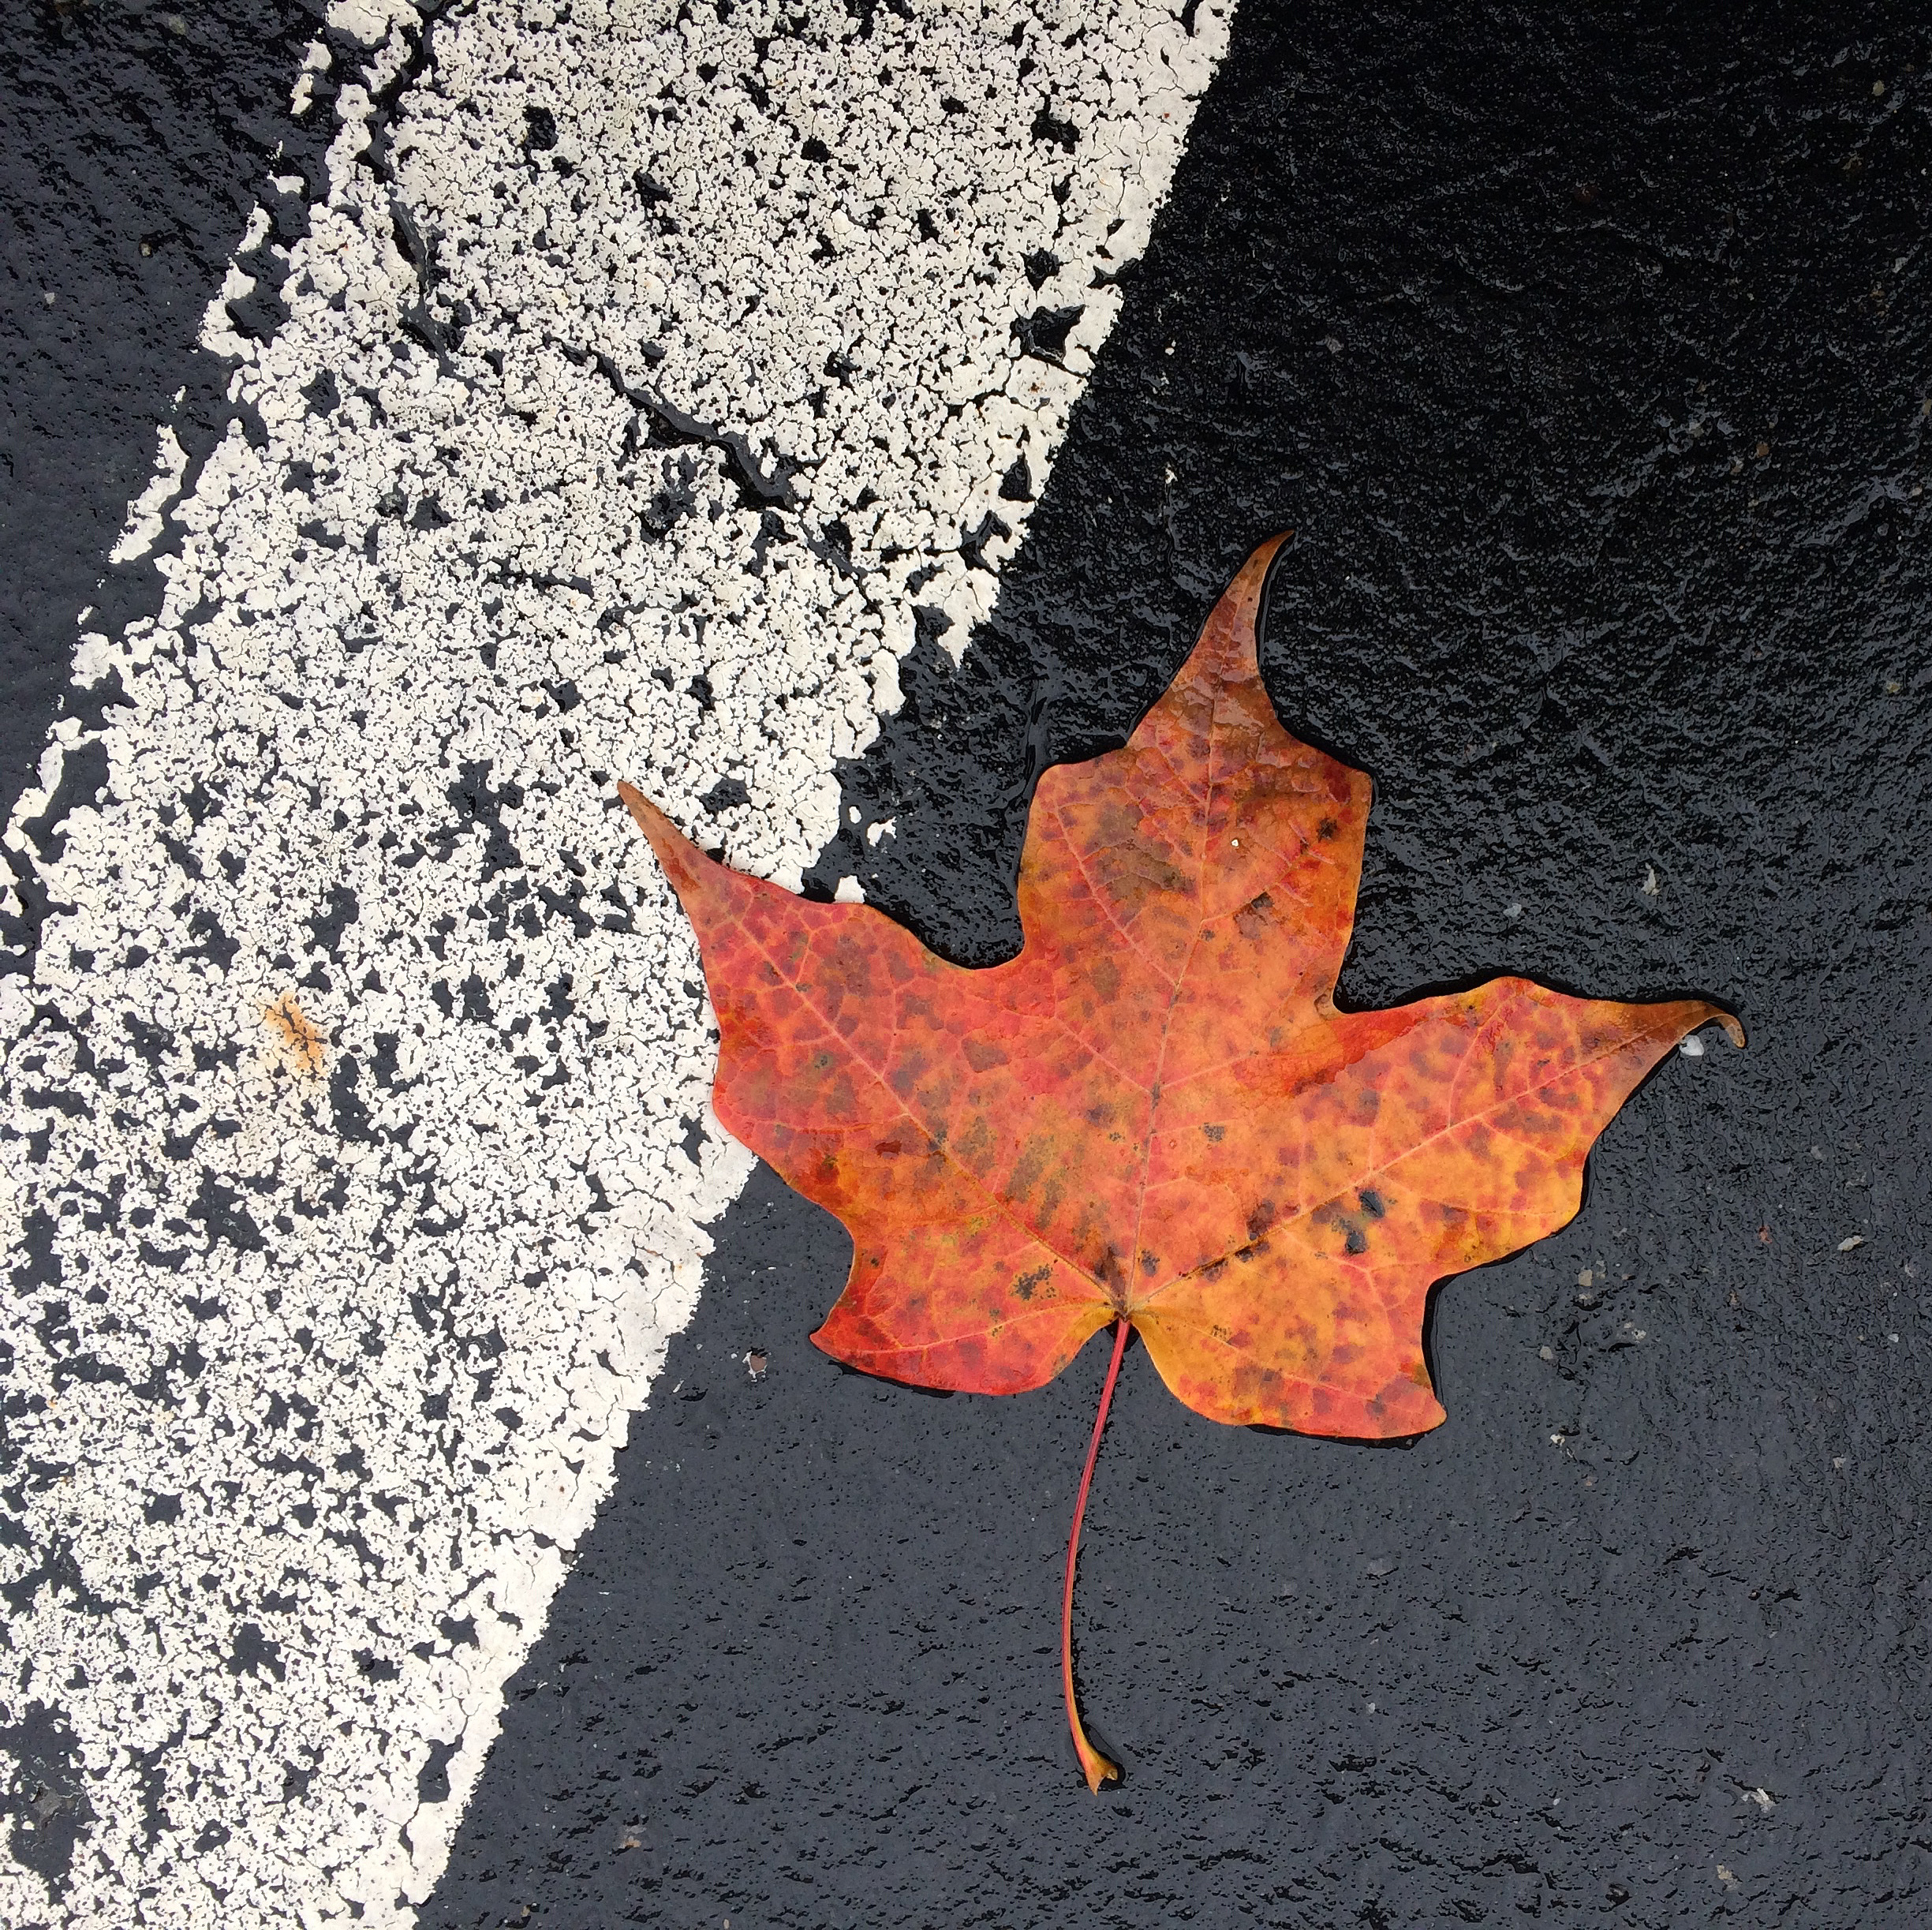 leaf on blacktop